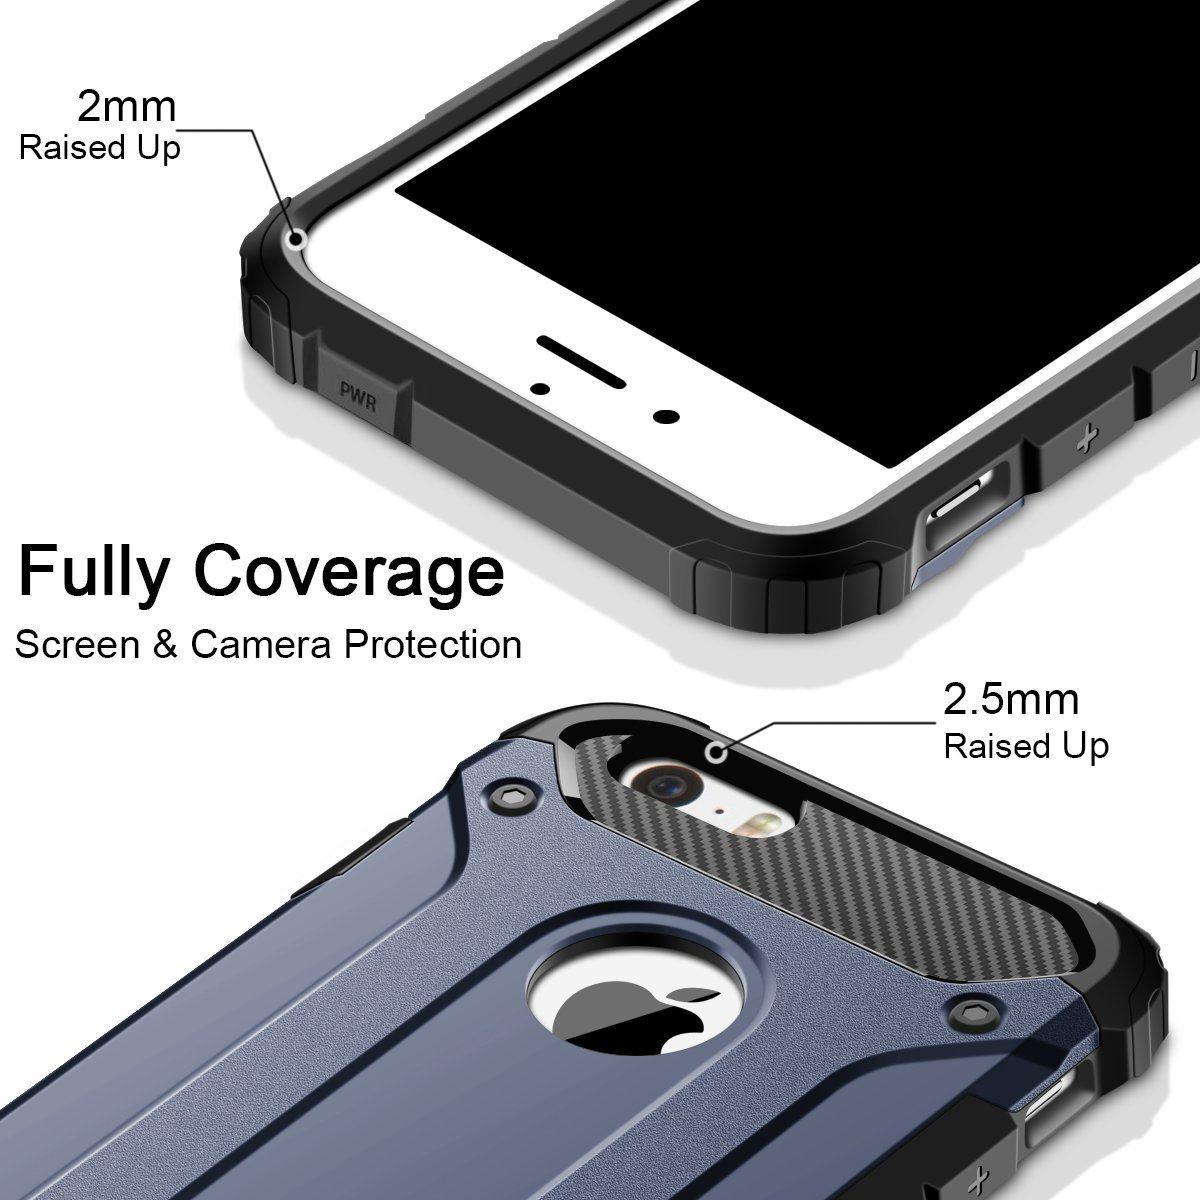 thumbnail 68 - For Apple iPhone 11 Pro Max XR Xs X 8 7 Plus 6 5 Se Case Cover Impact Heavy Duty